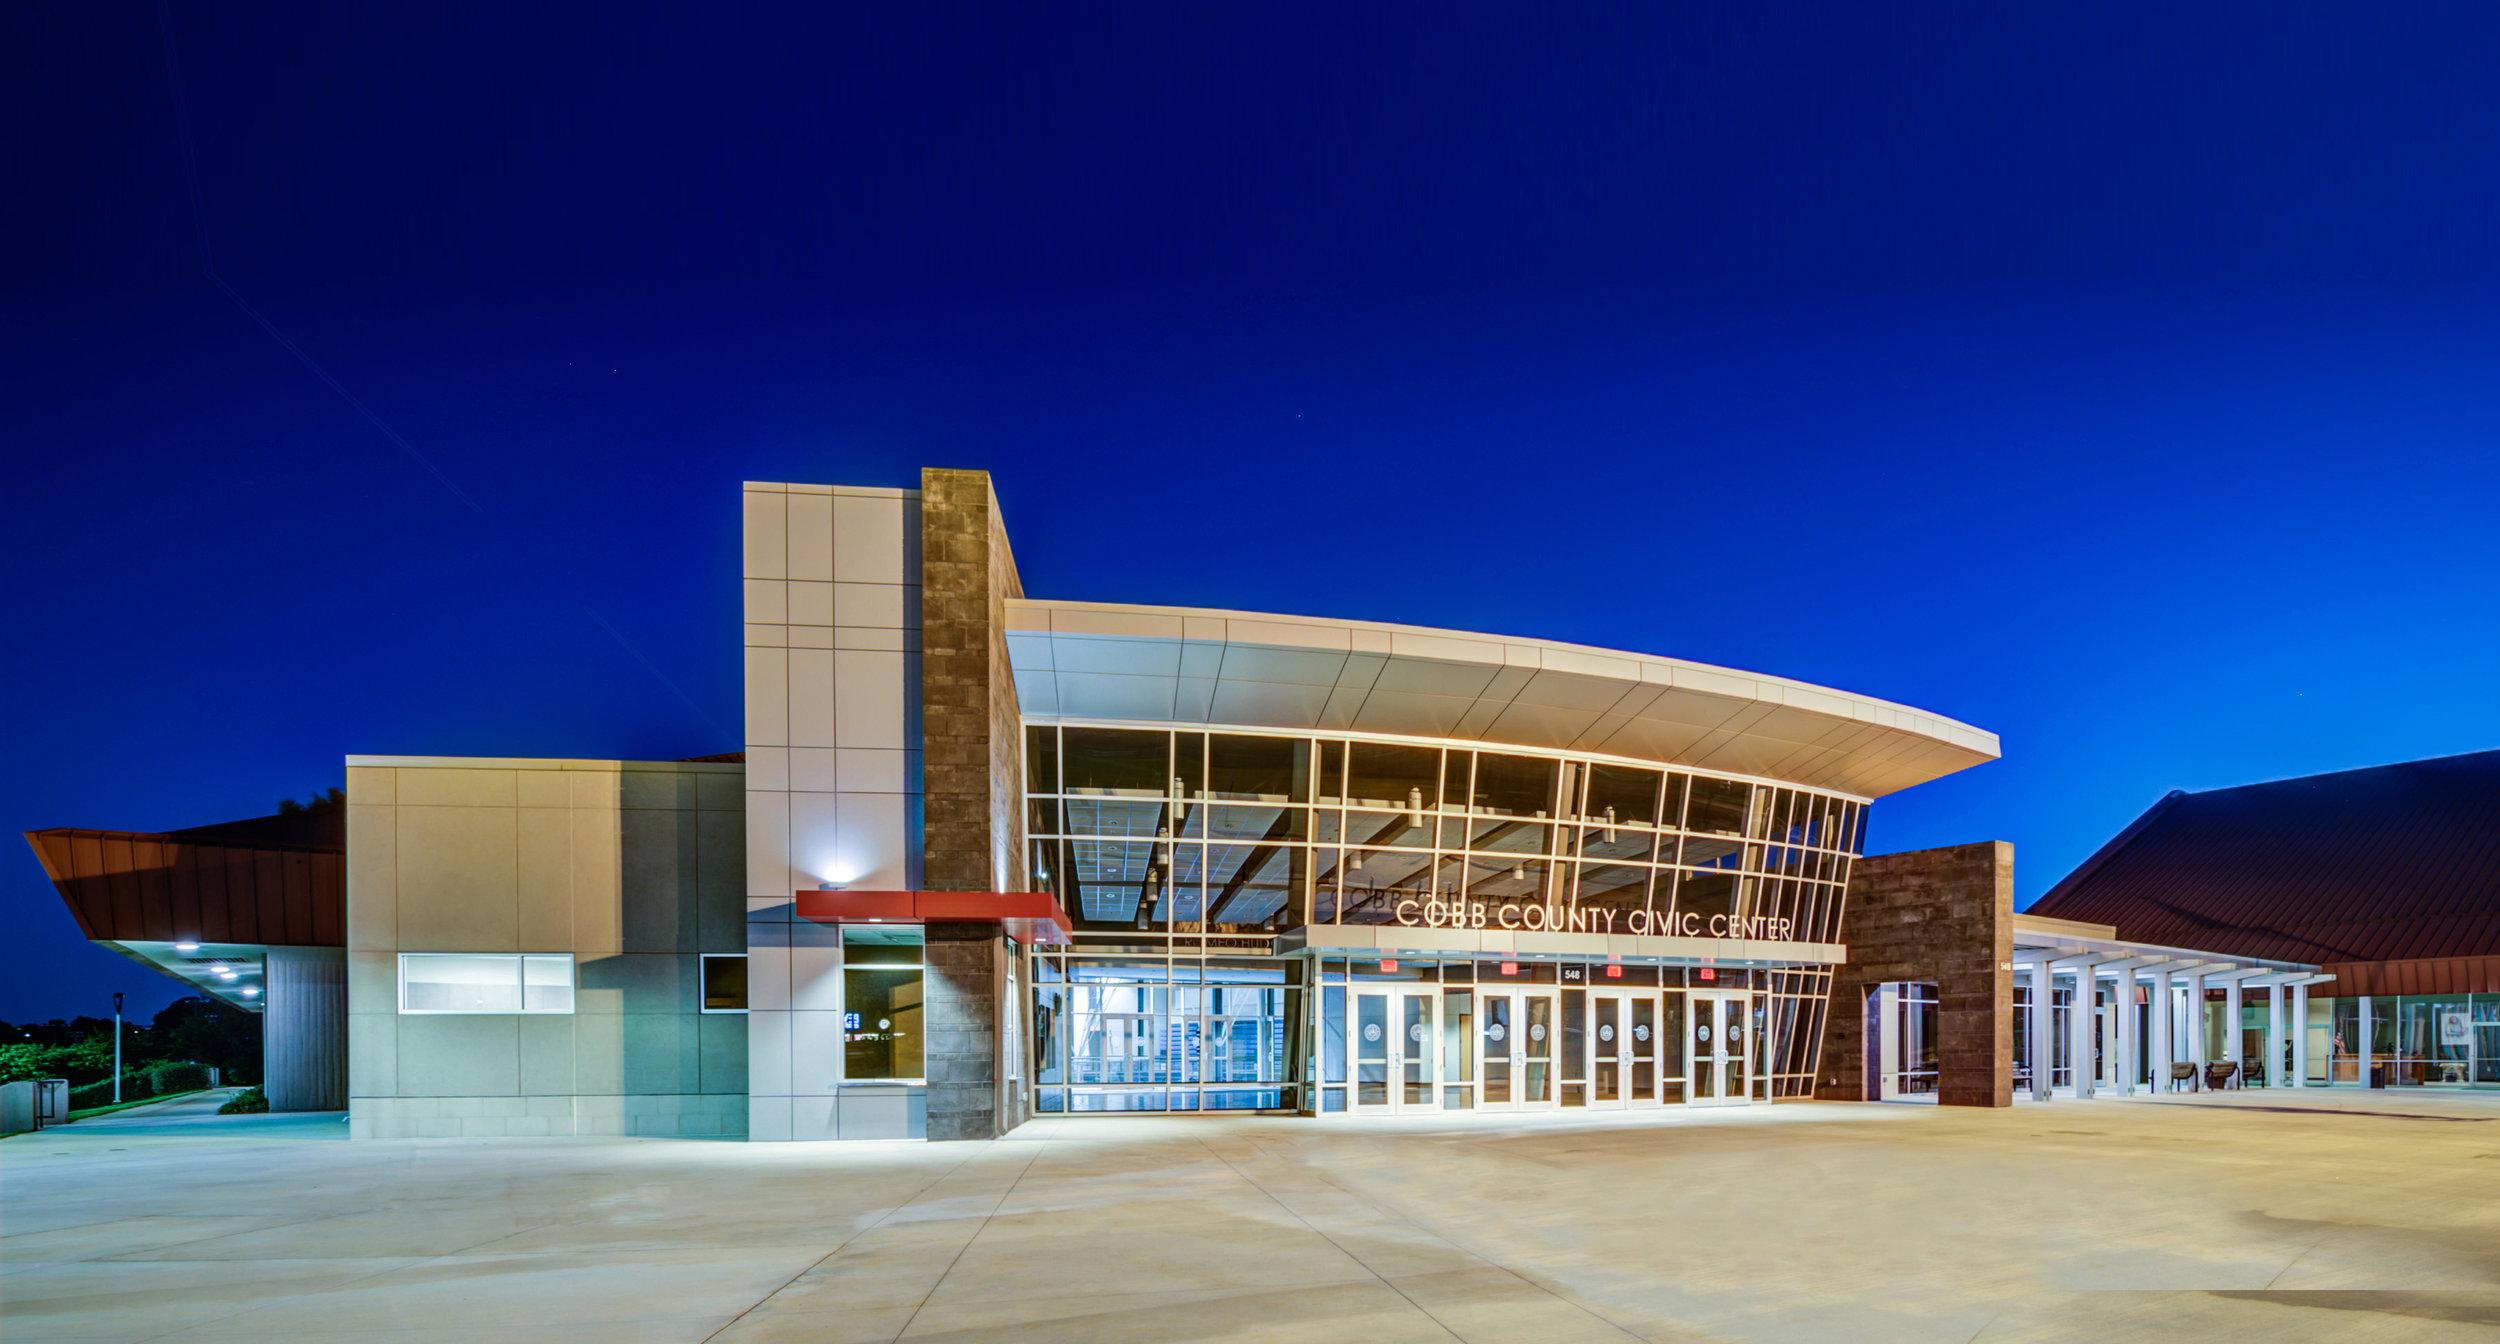 Cobb Civic Center - Exterior_6650 (06-08-2016).jpg